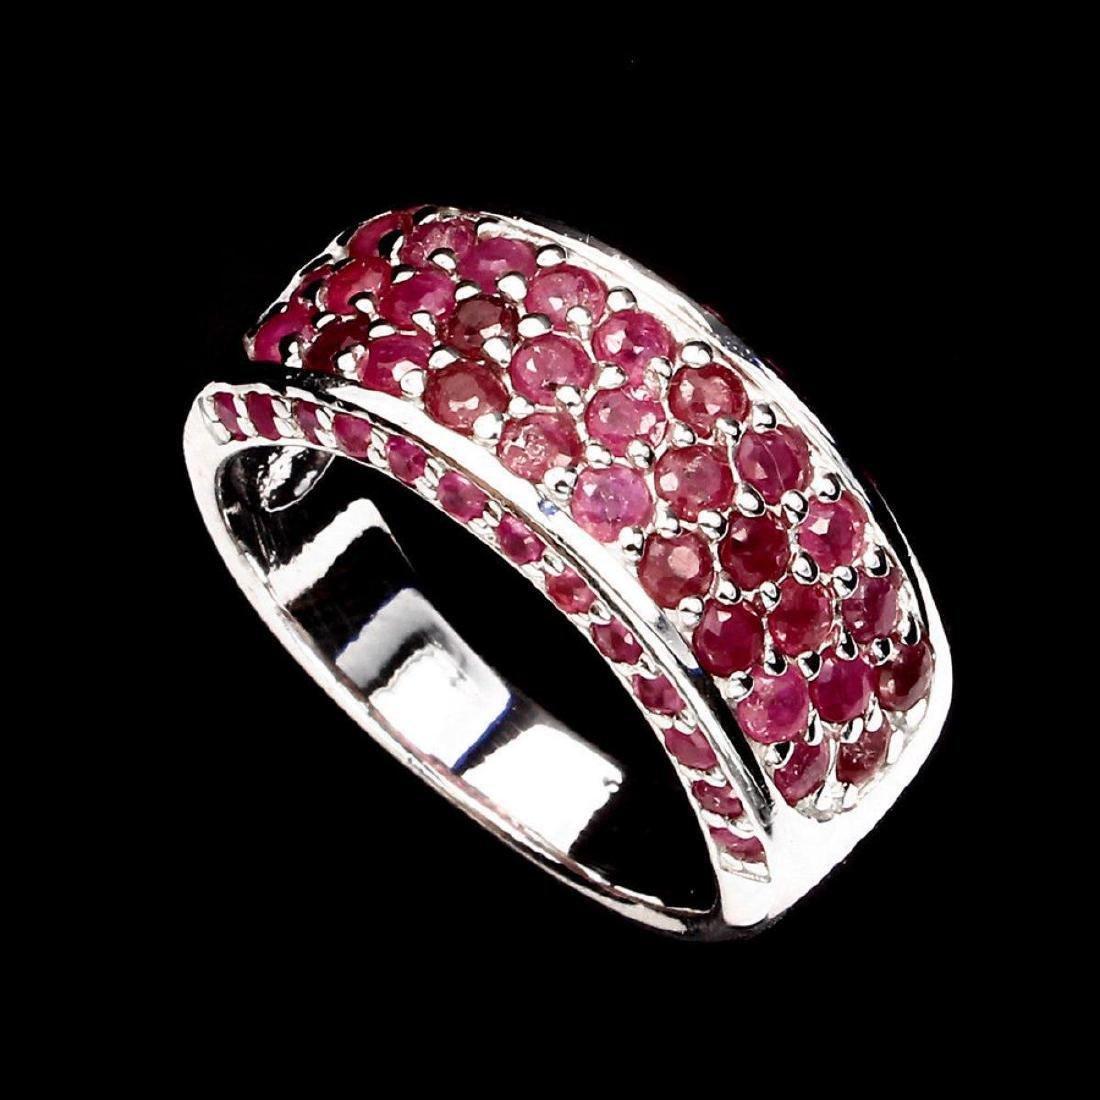 Natural Stunning 31.74 Carat Ruby Ring - 2